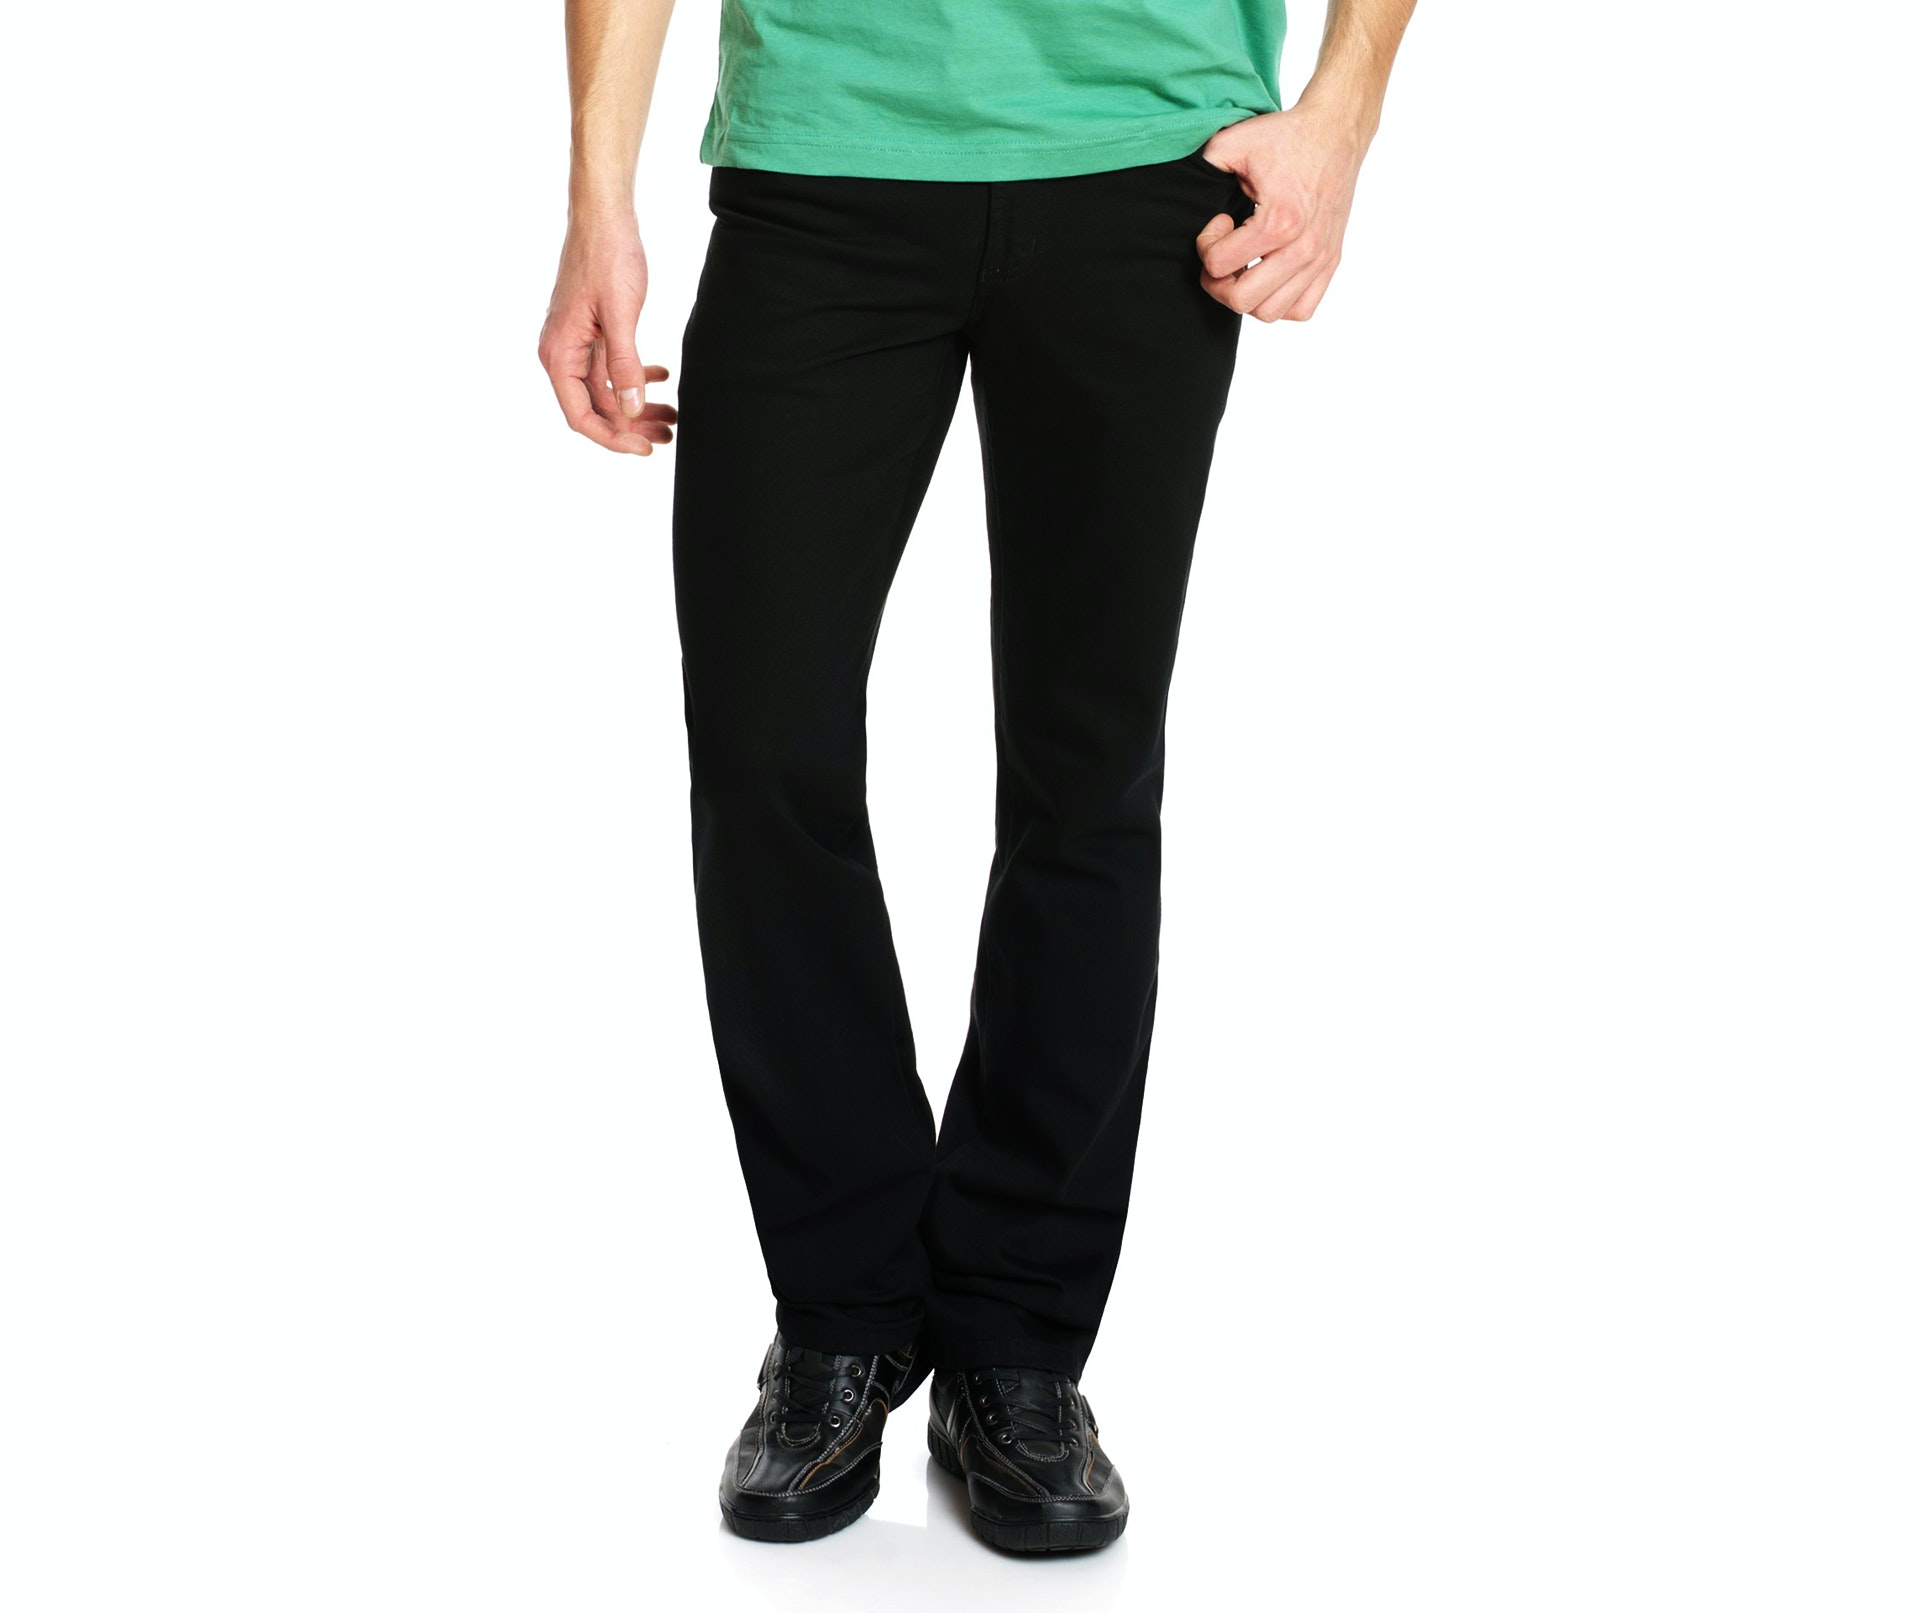 Revils Jeans 302 black Stretch extra lang